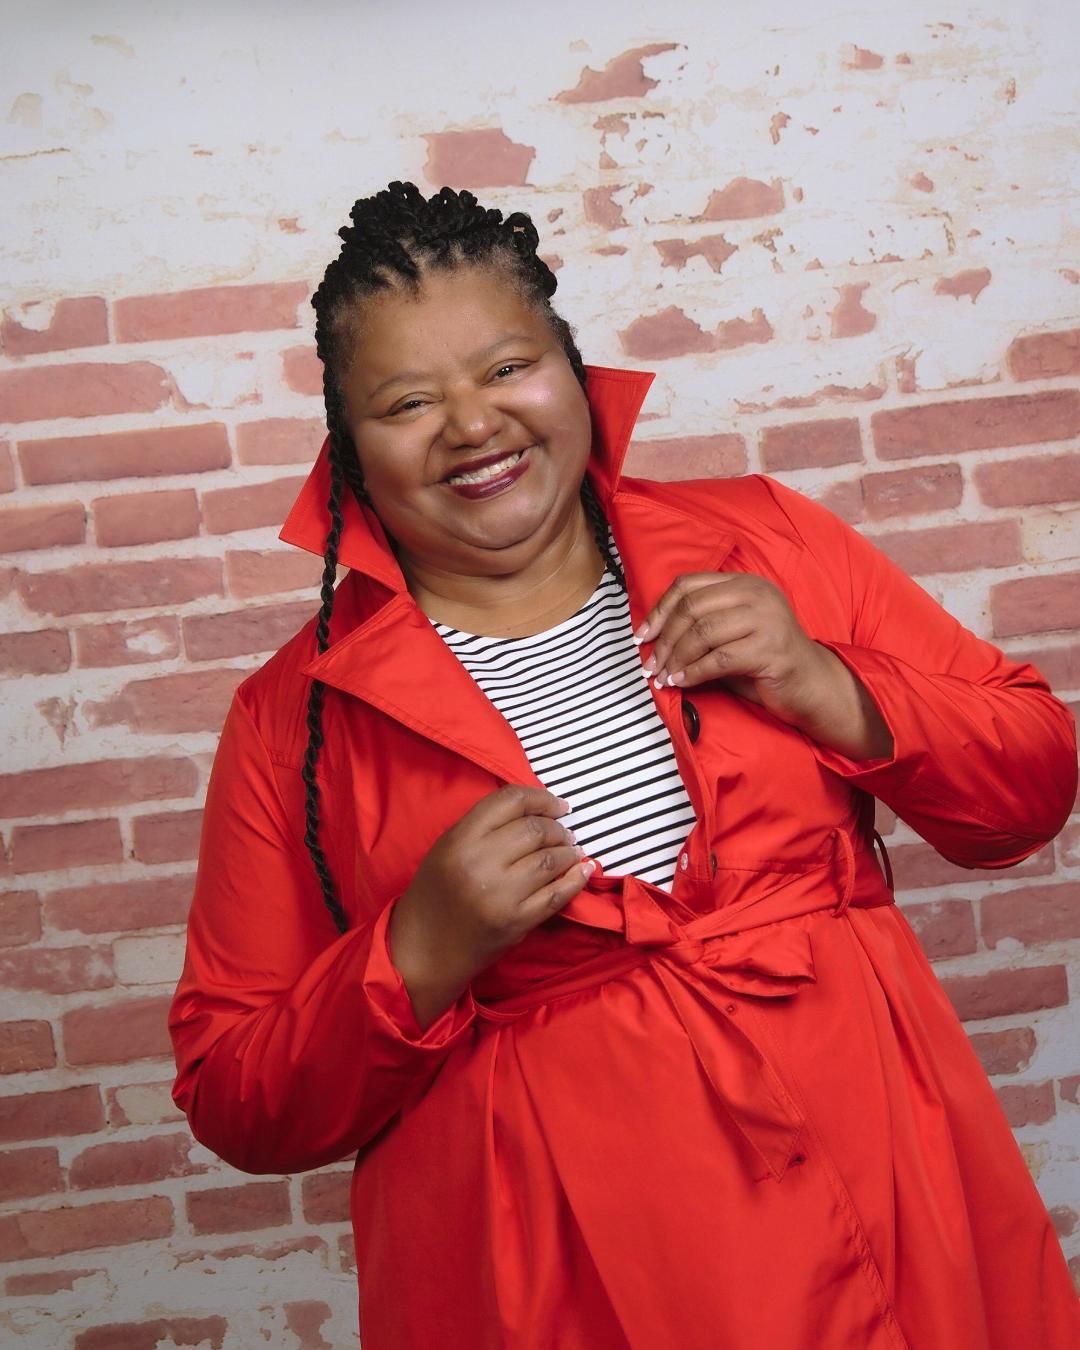 Sherri Winston's JADA SLY, ARTIST & SPY + Giveaway